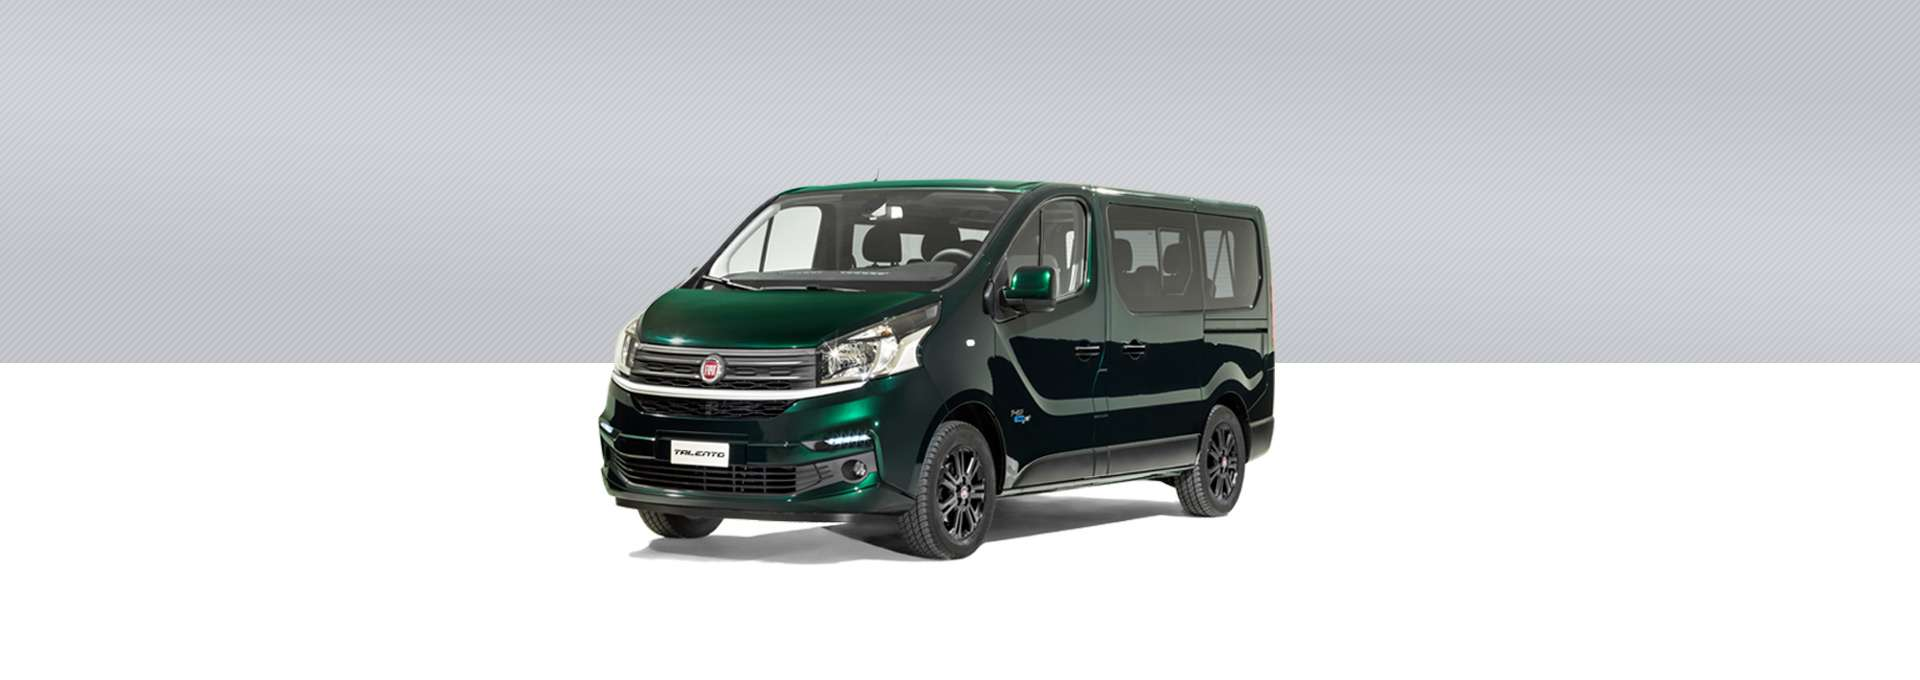 Fiat Talento Transporte Personas